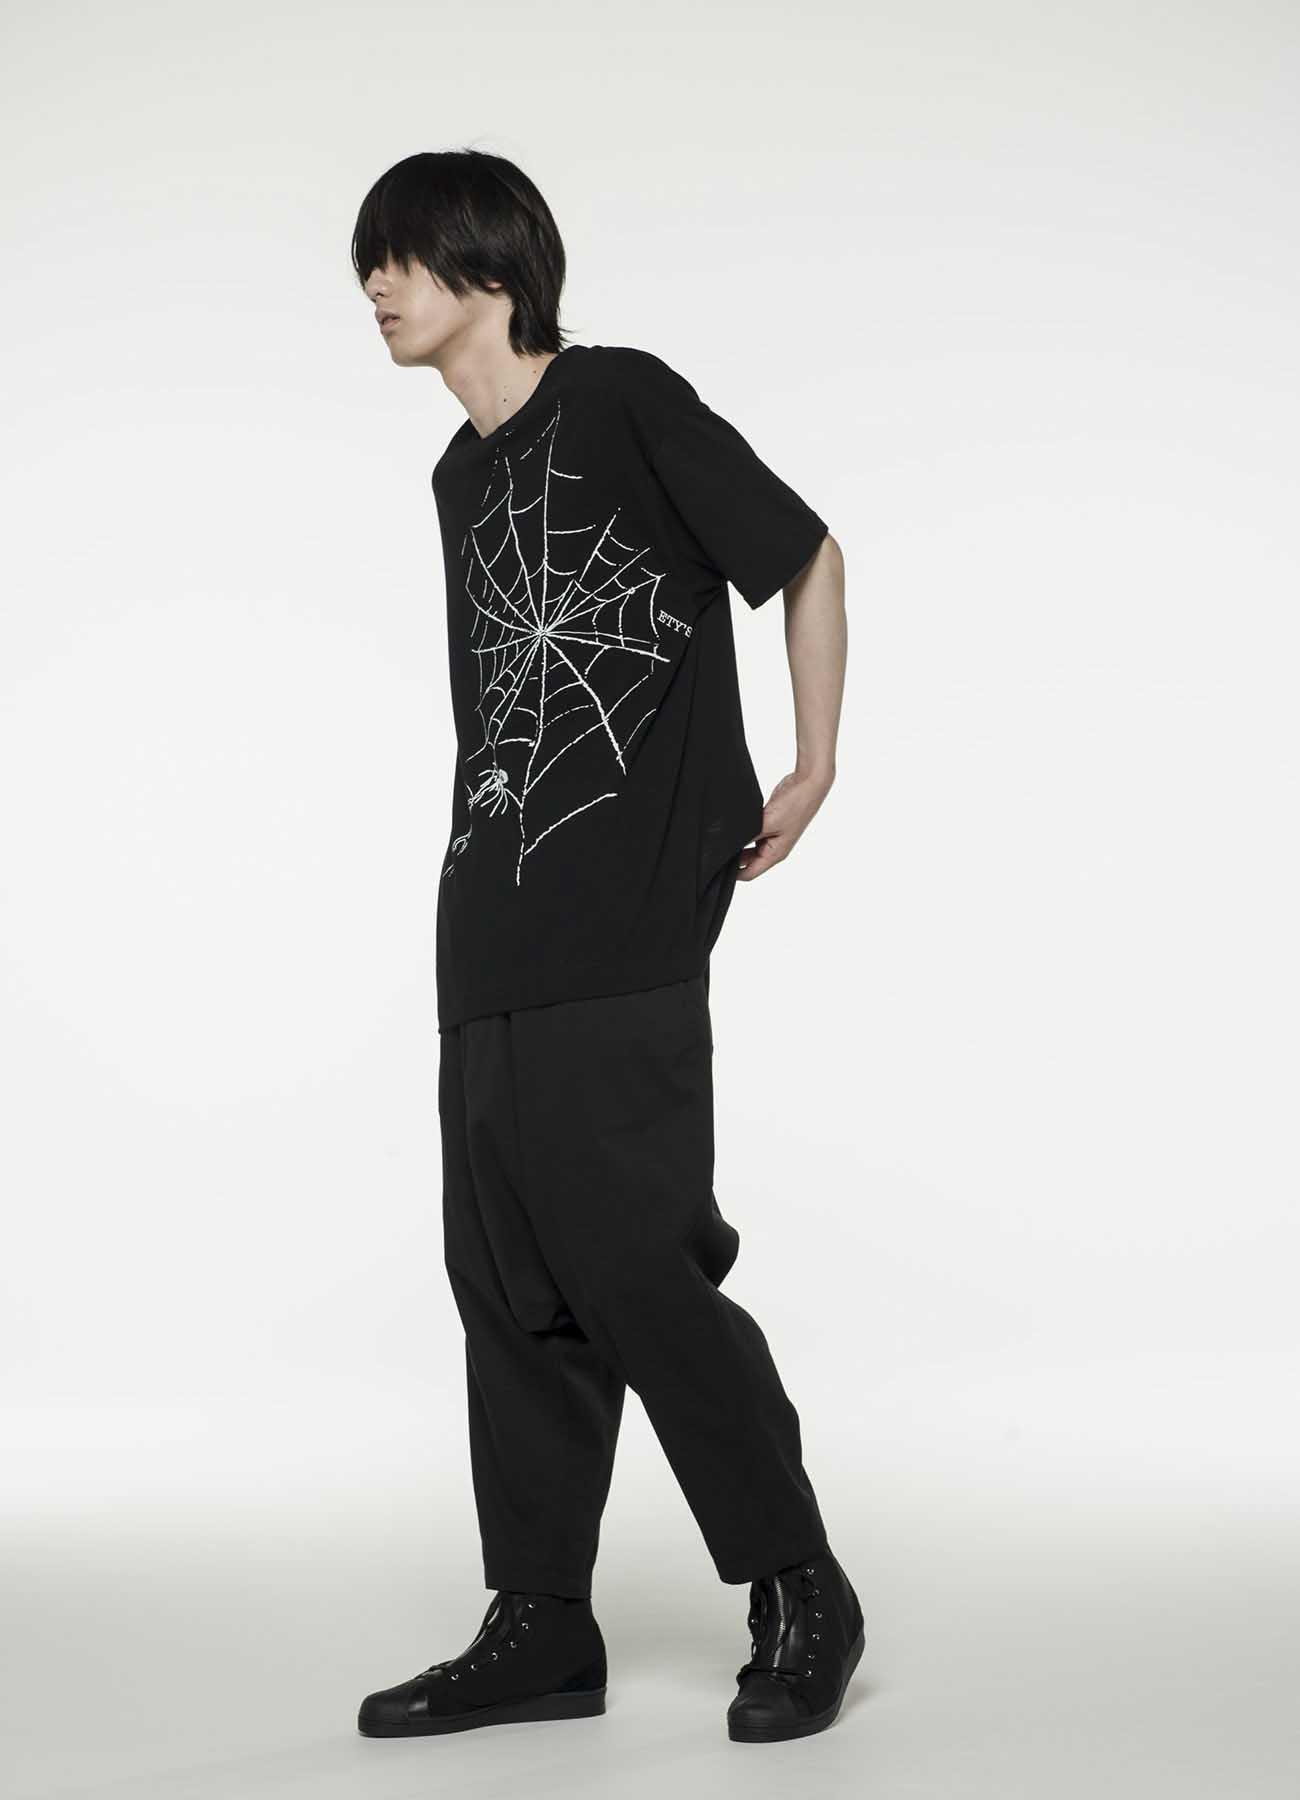 20/CottonJersey The Spiderweb T-shirt